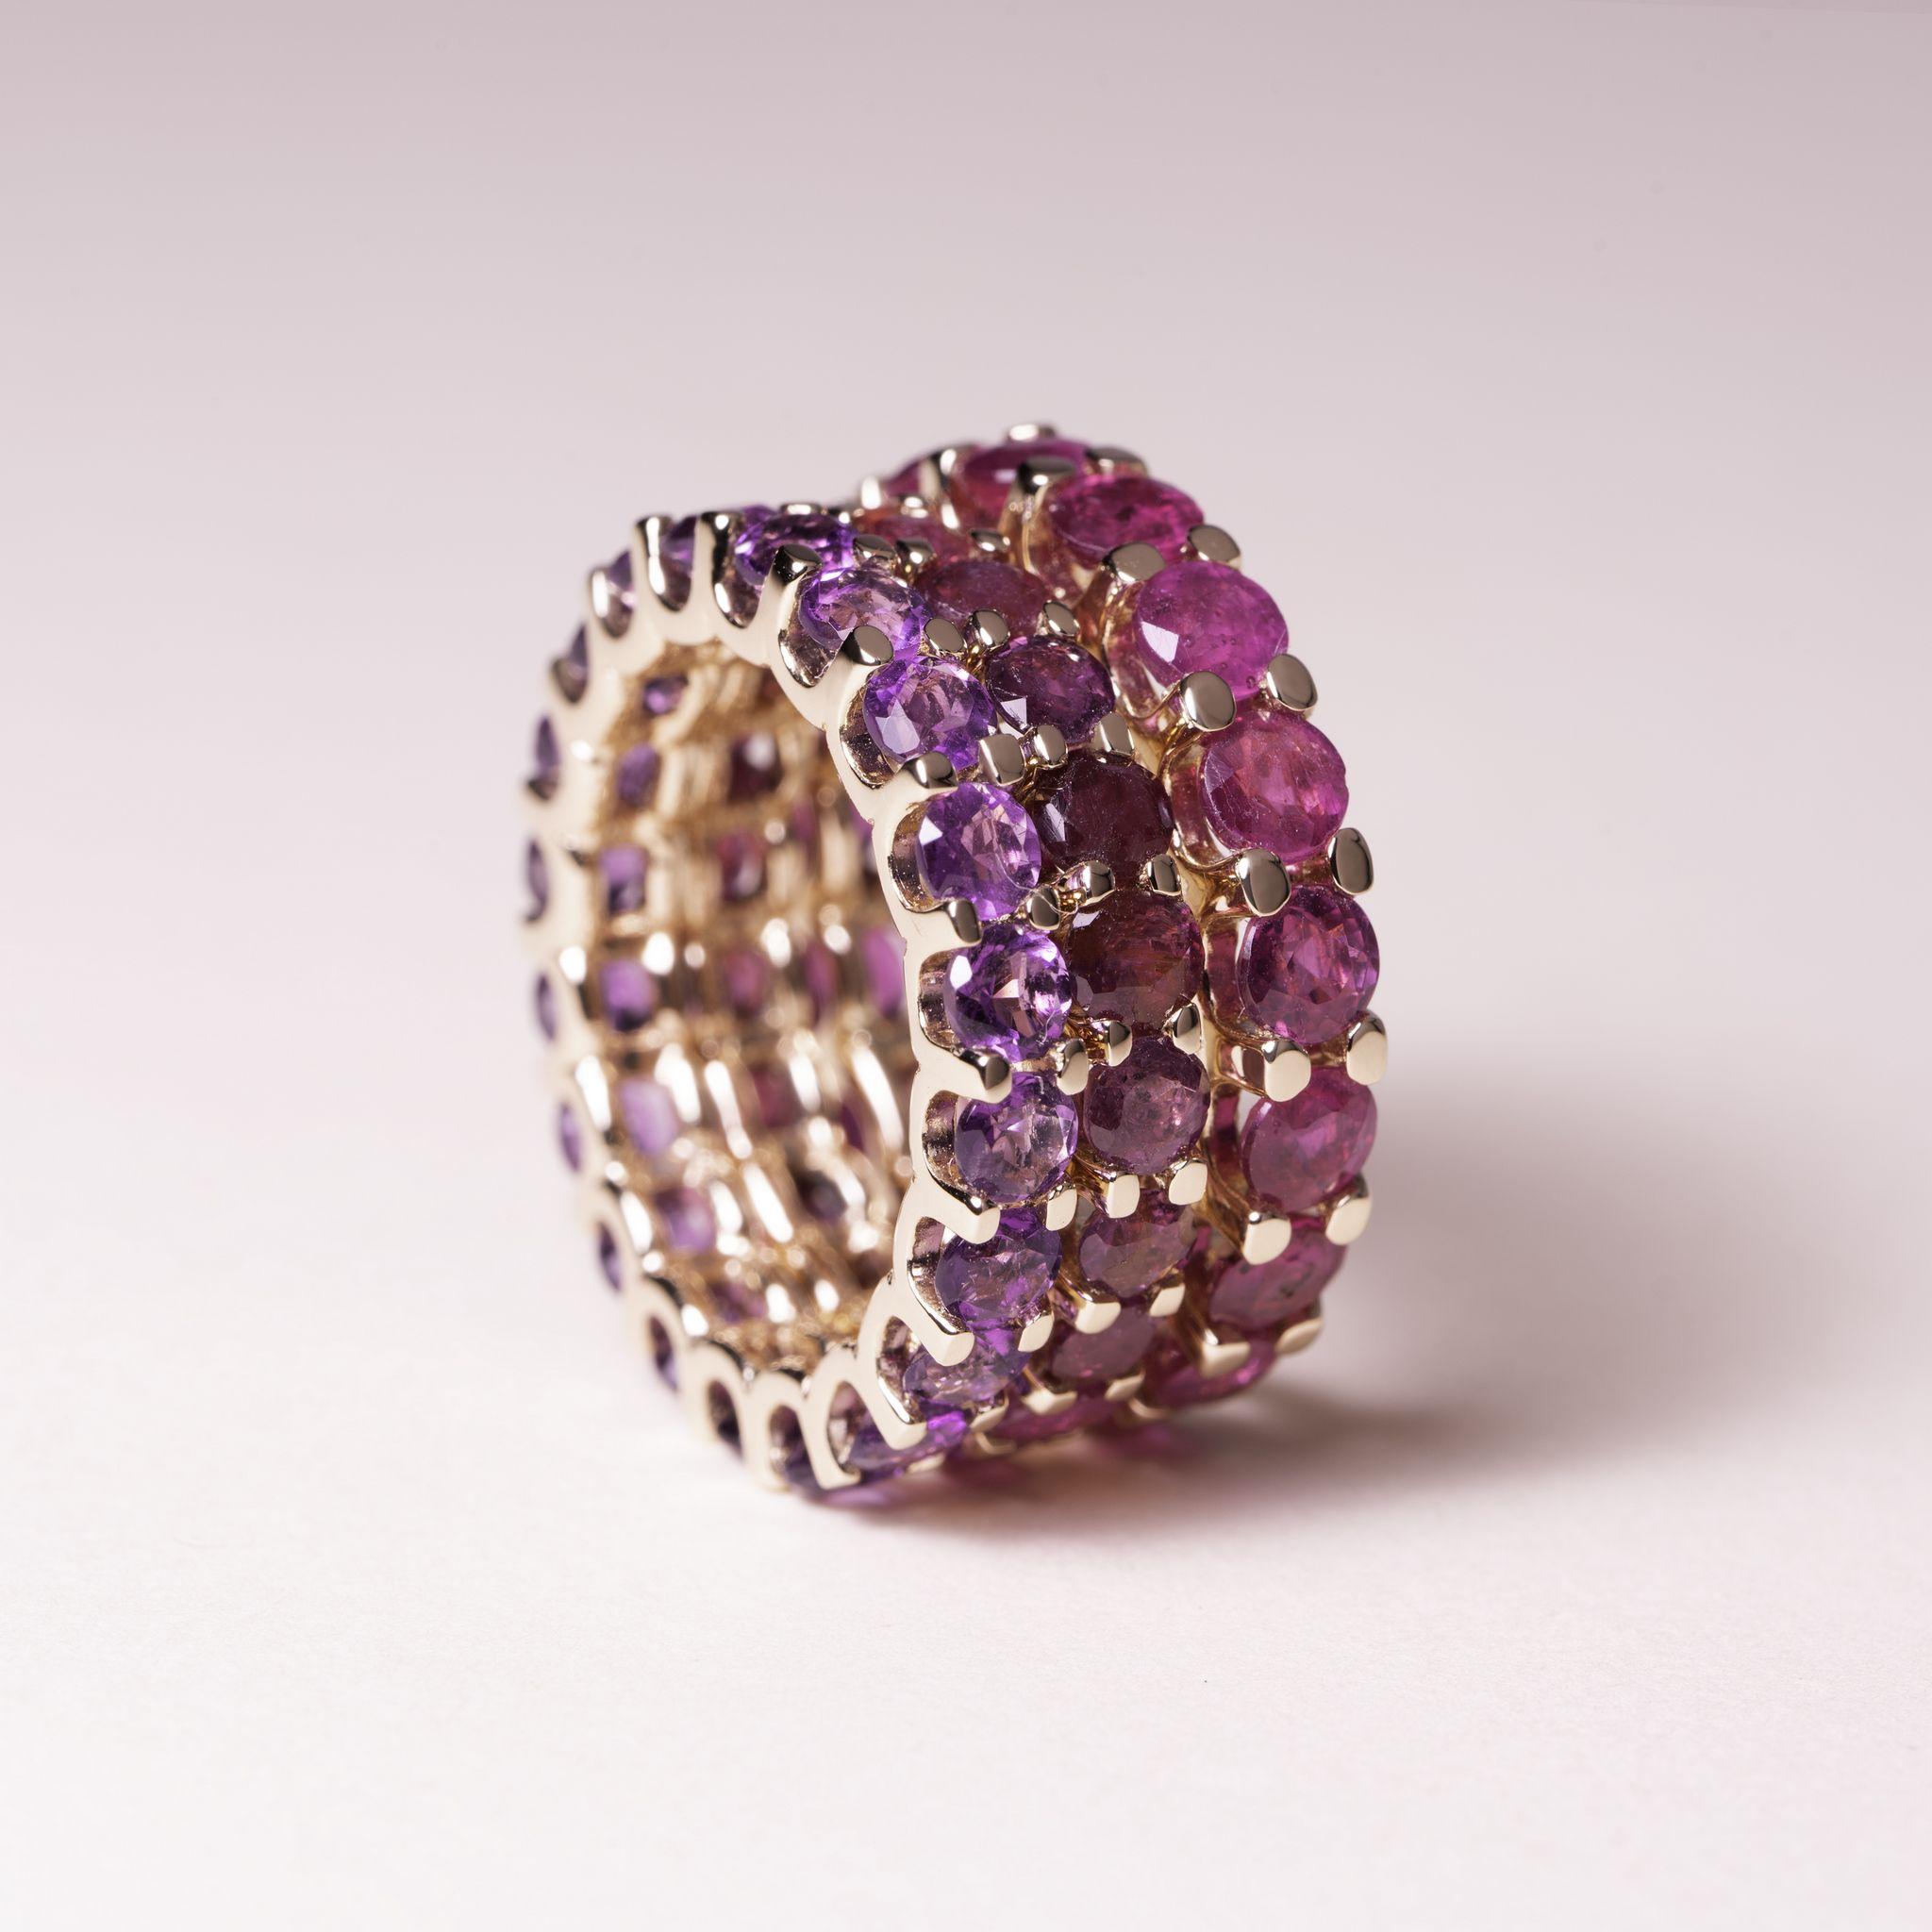 inel din aur cu pietre pretioase rubine mijoux p3 IDR S R